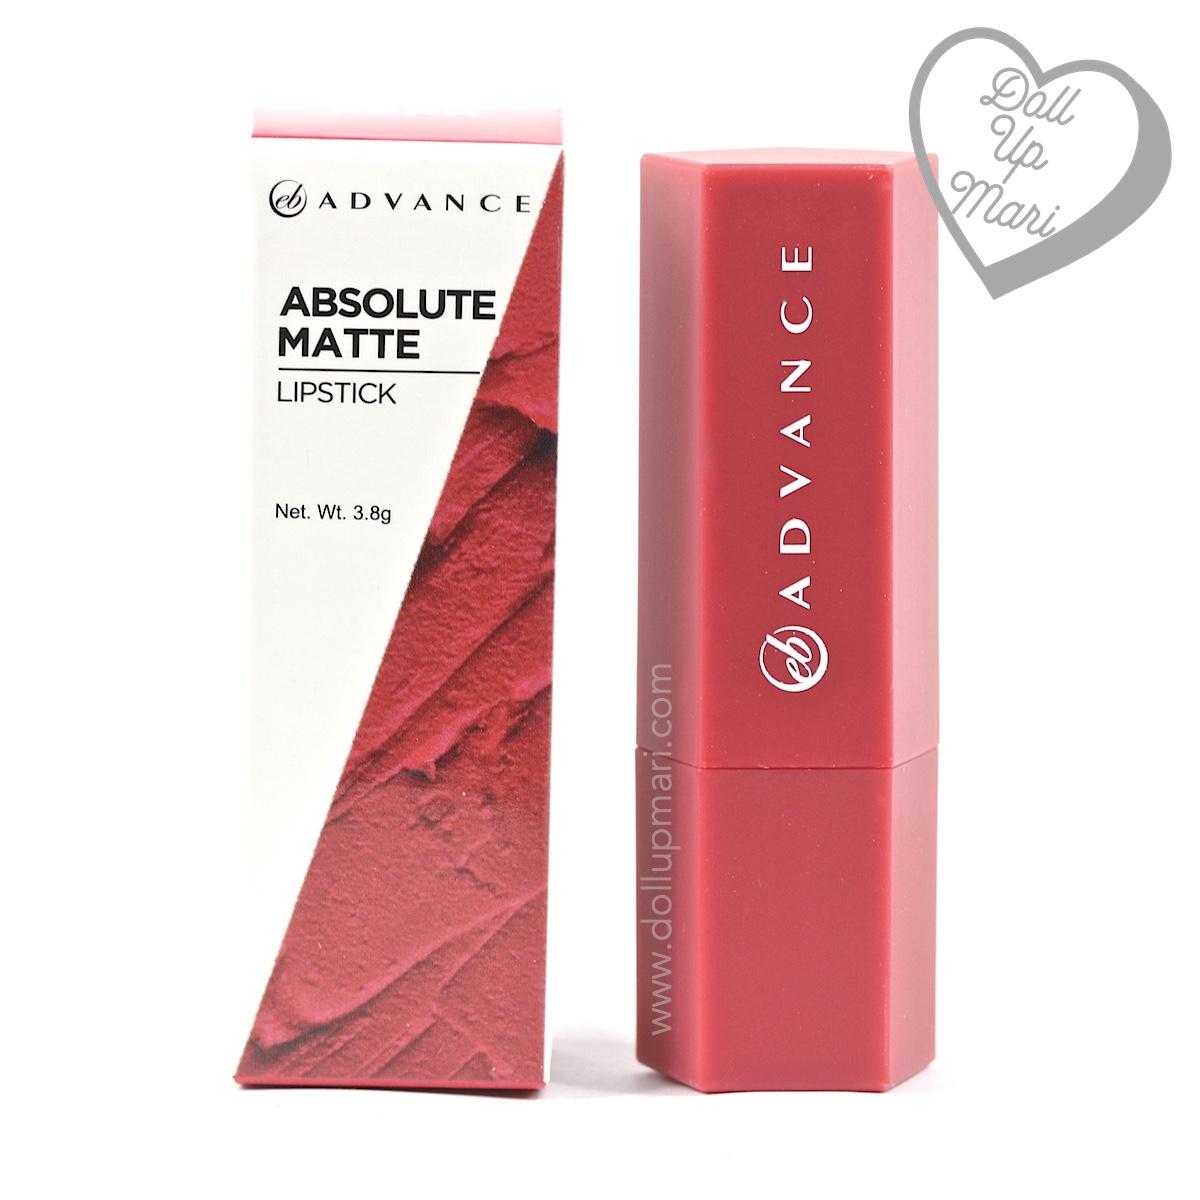 EB Advance Absolute Matte Lipstick (Perk) Review, Swatch